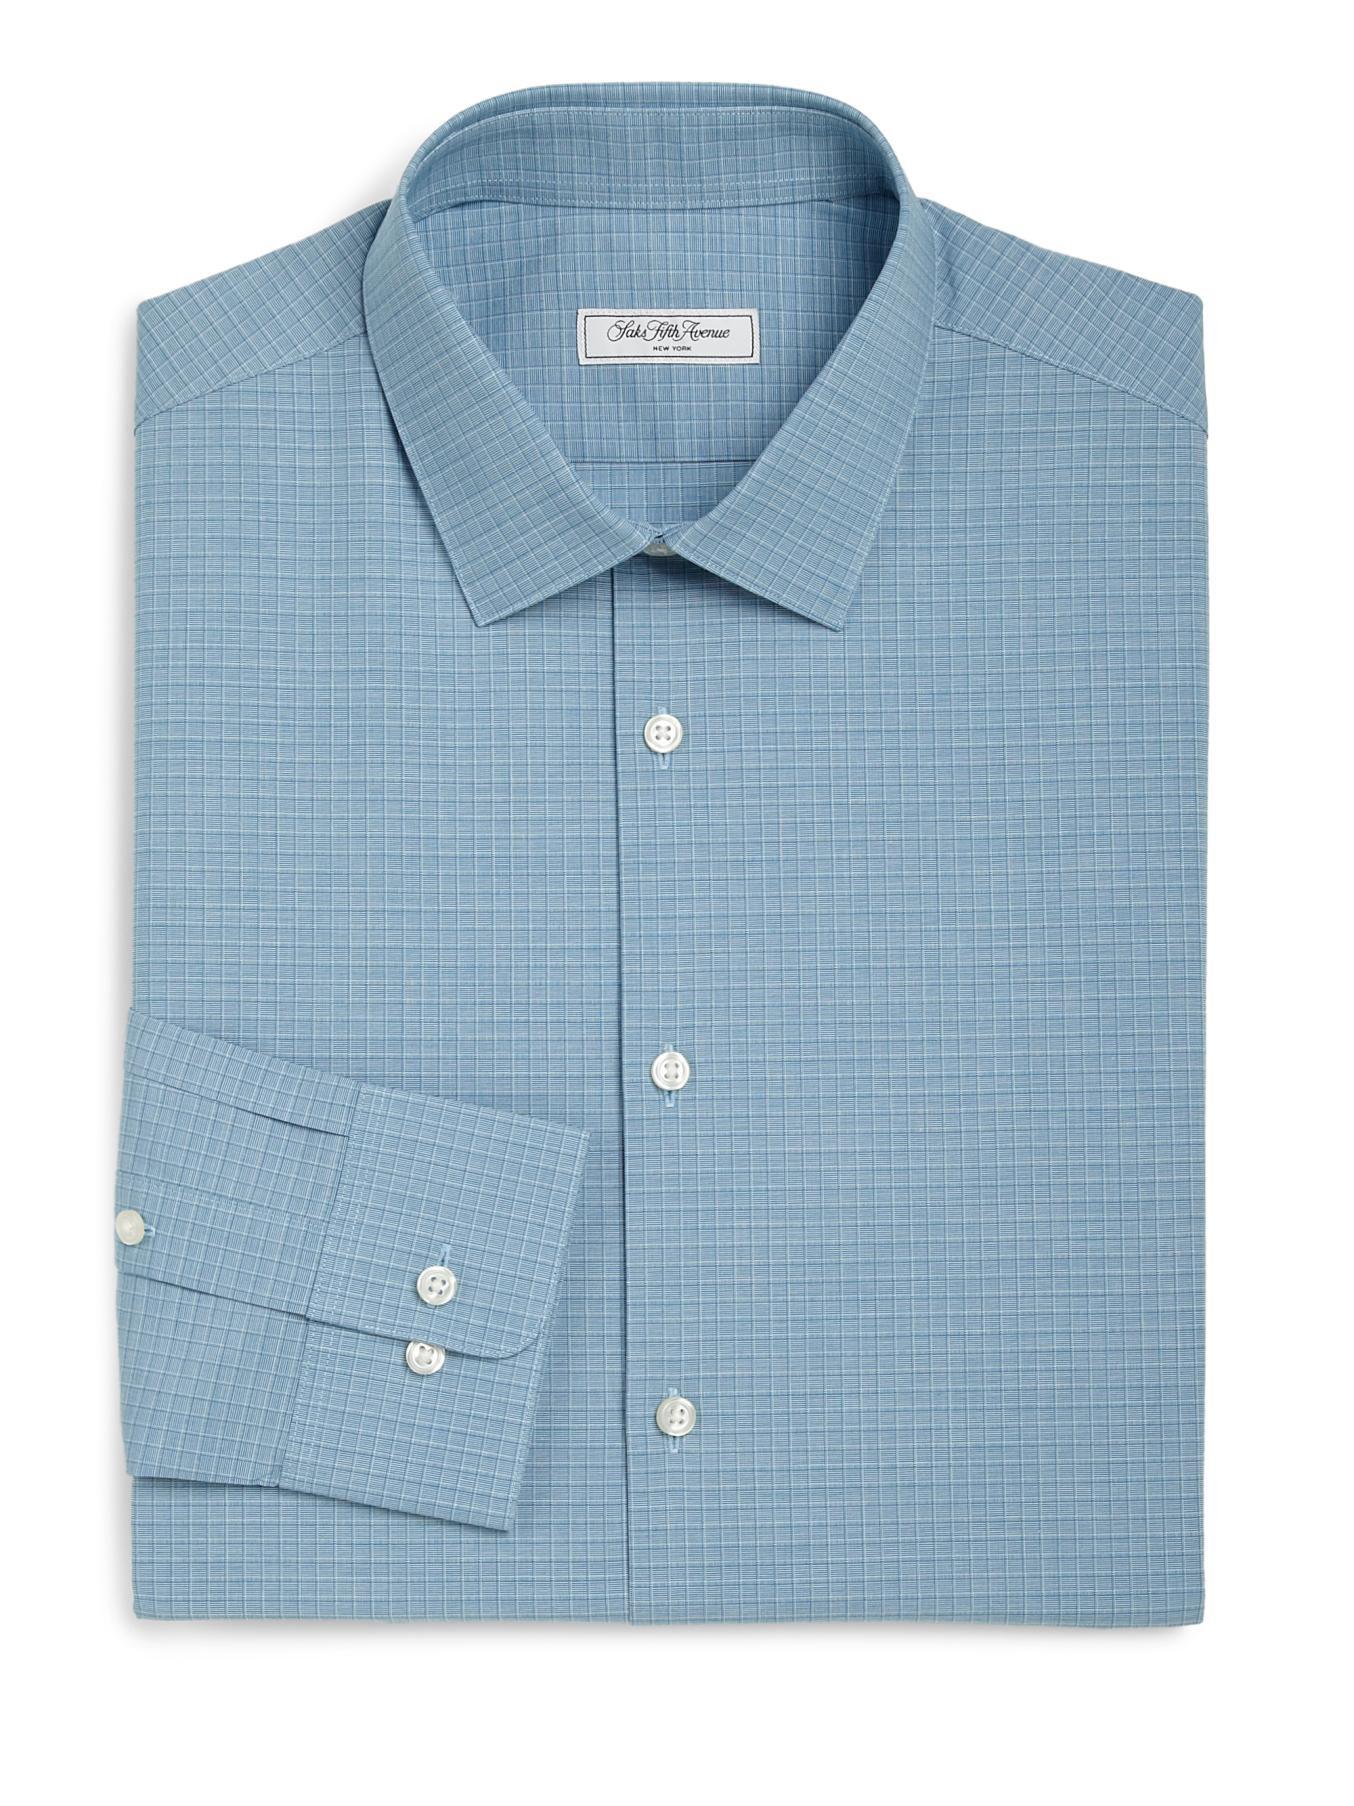 Lyst saks fifth avenue modern fit check dress shirt in for Modern fit dress shirt